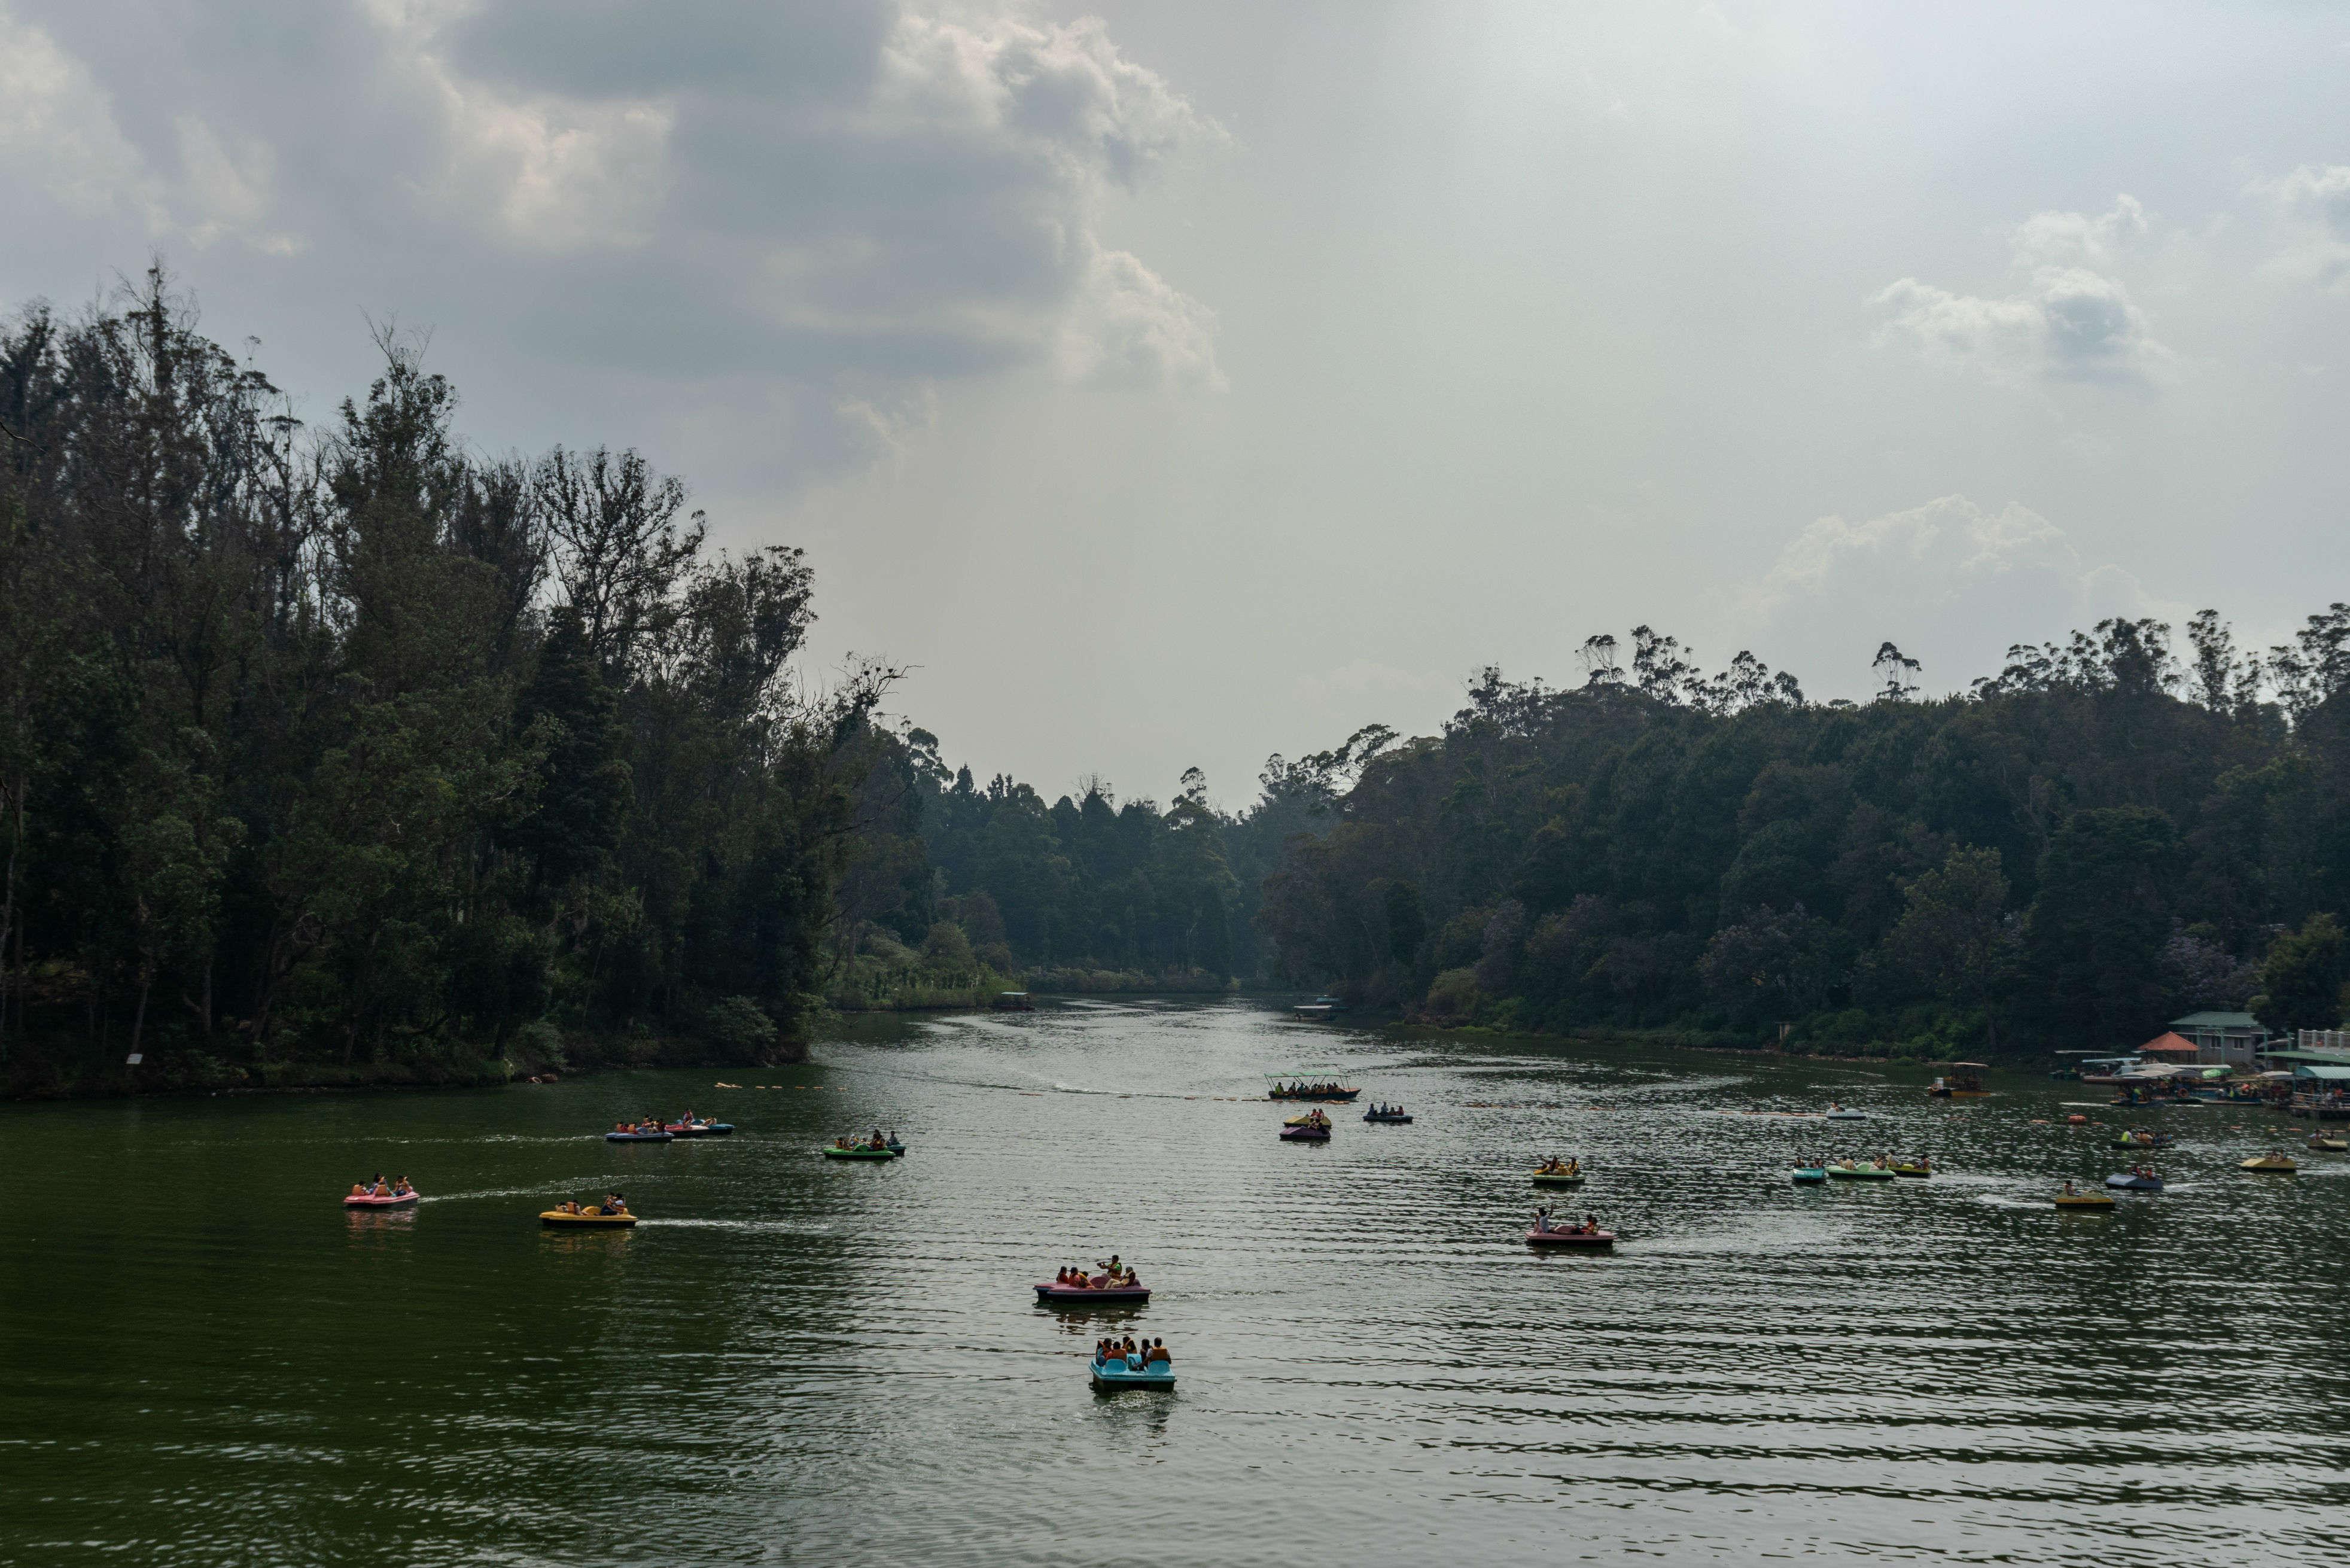 Take a boat ride in Tamil Nadu's picturesque Courtallam region